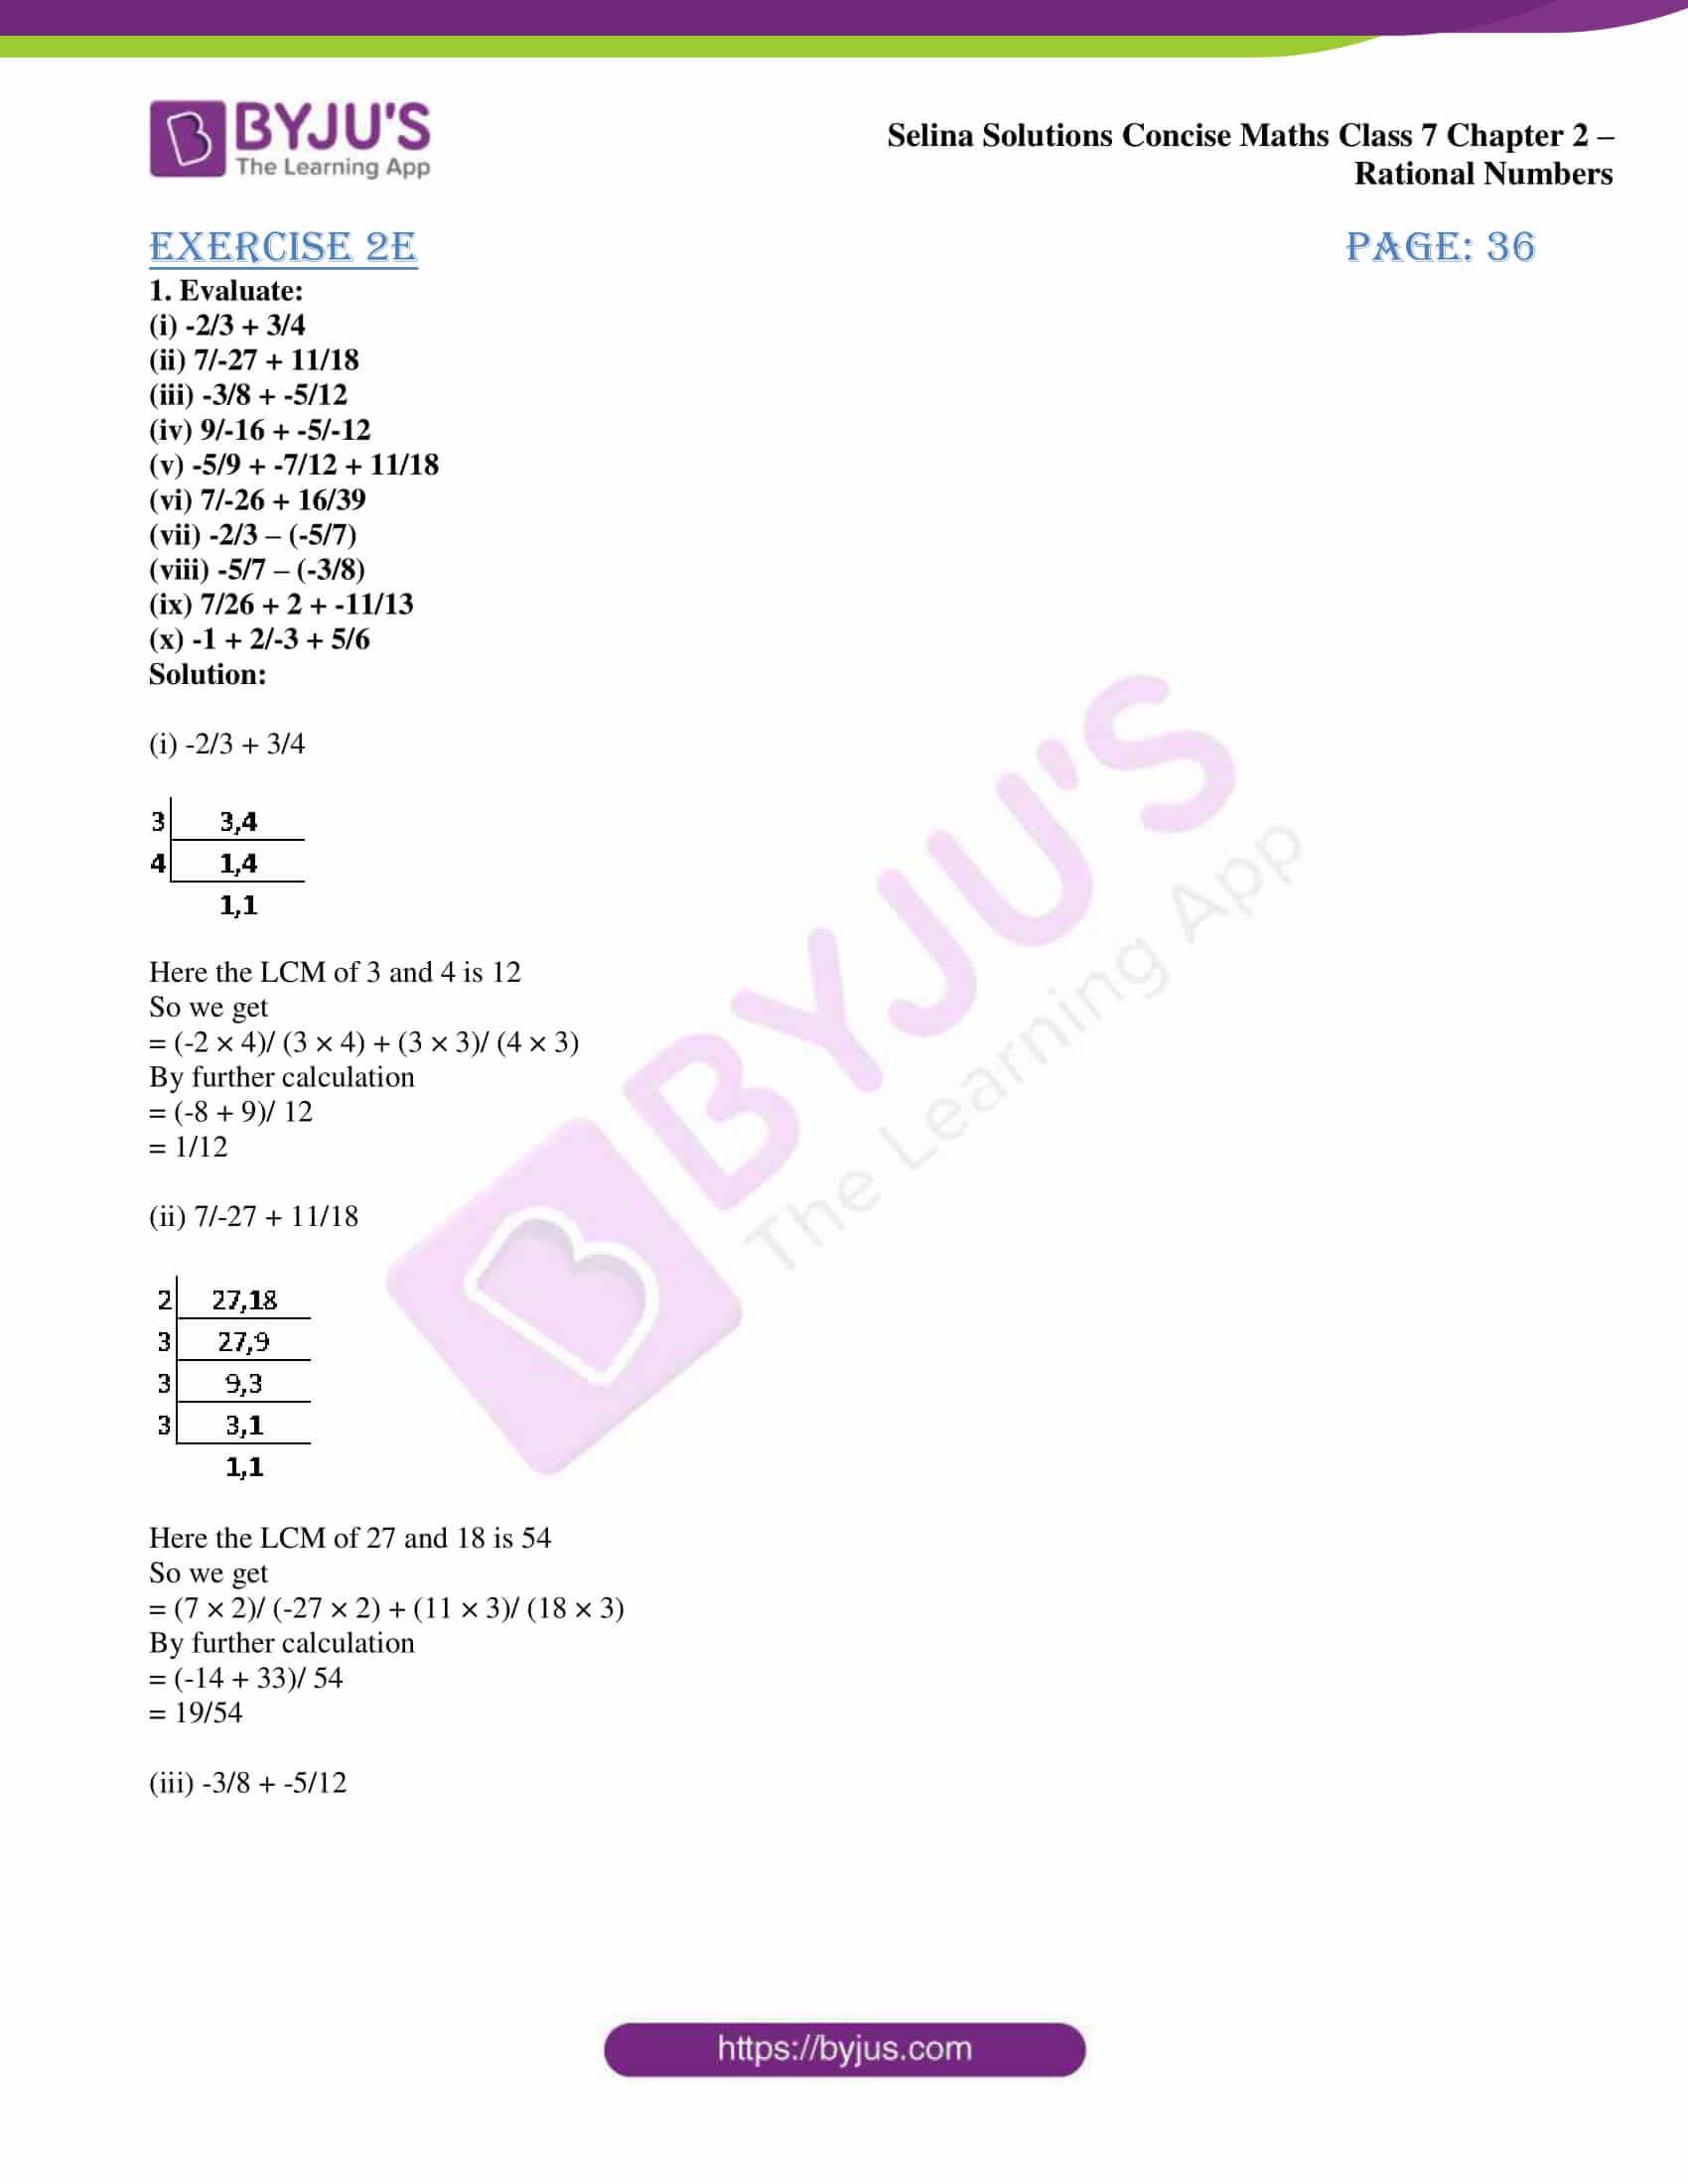 selina sol concise maths class 7 ch2 ex 2e 1